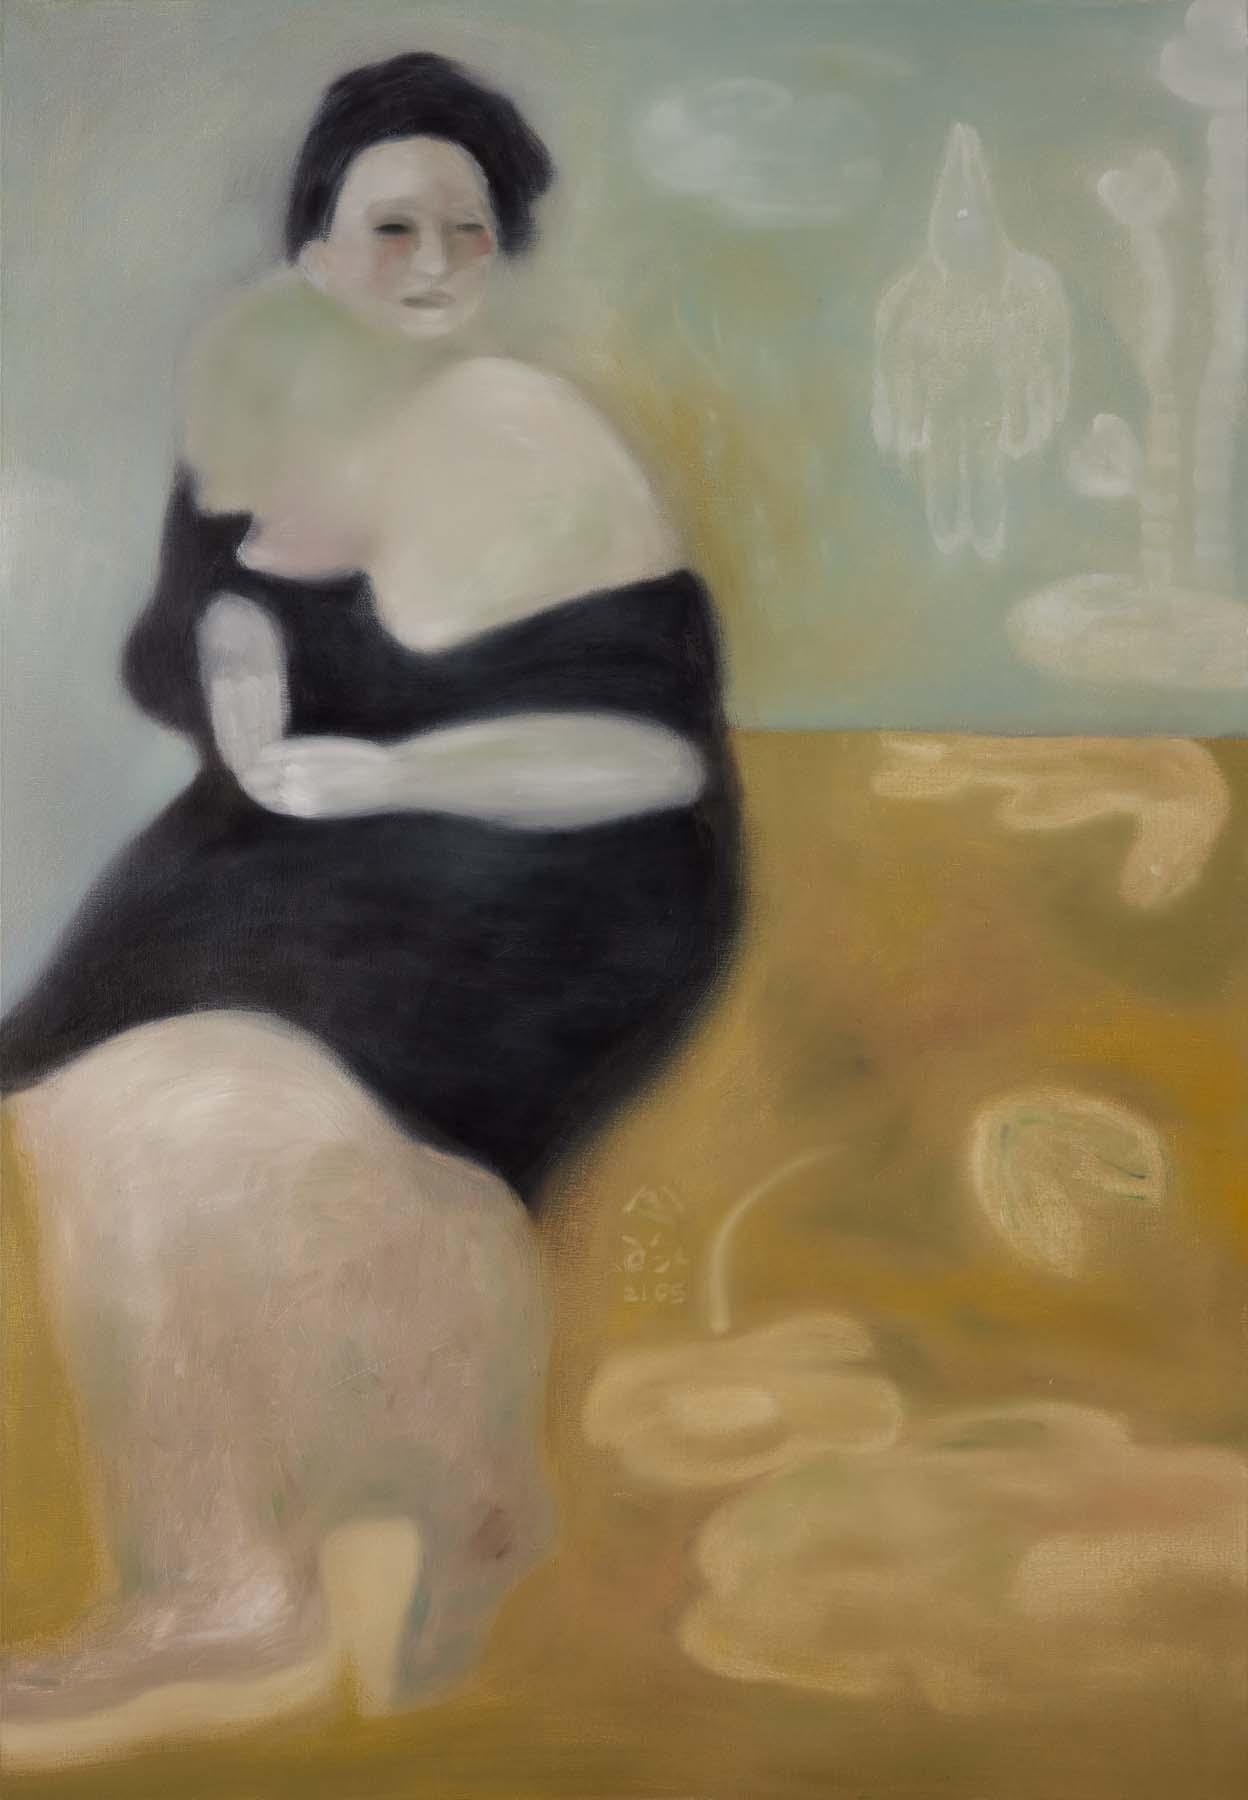 令詠 Ling Yung, 冥王星早餐 breakfast on pluto, 2021, 畫布油彩 oil on canvas, 173 x 120 cm